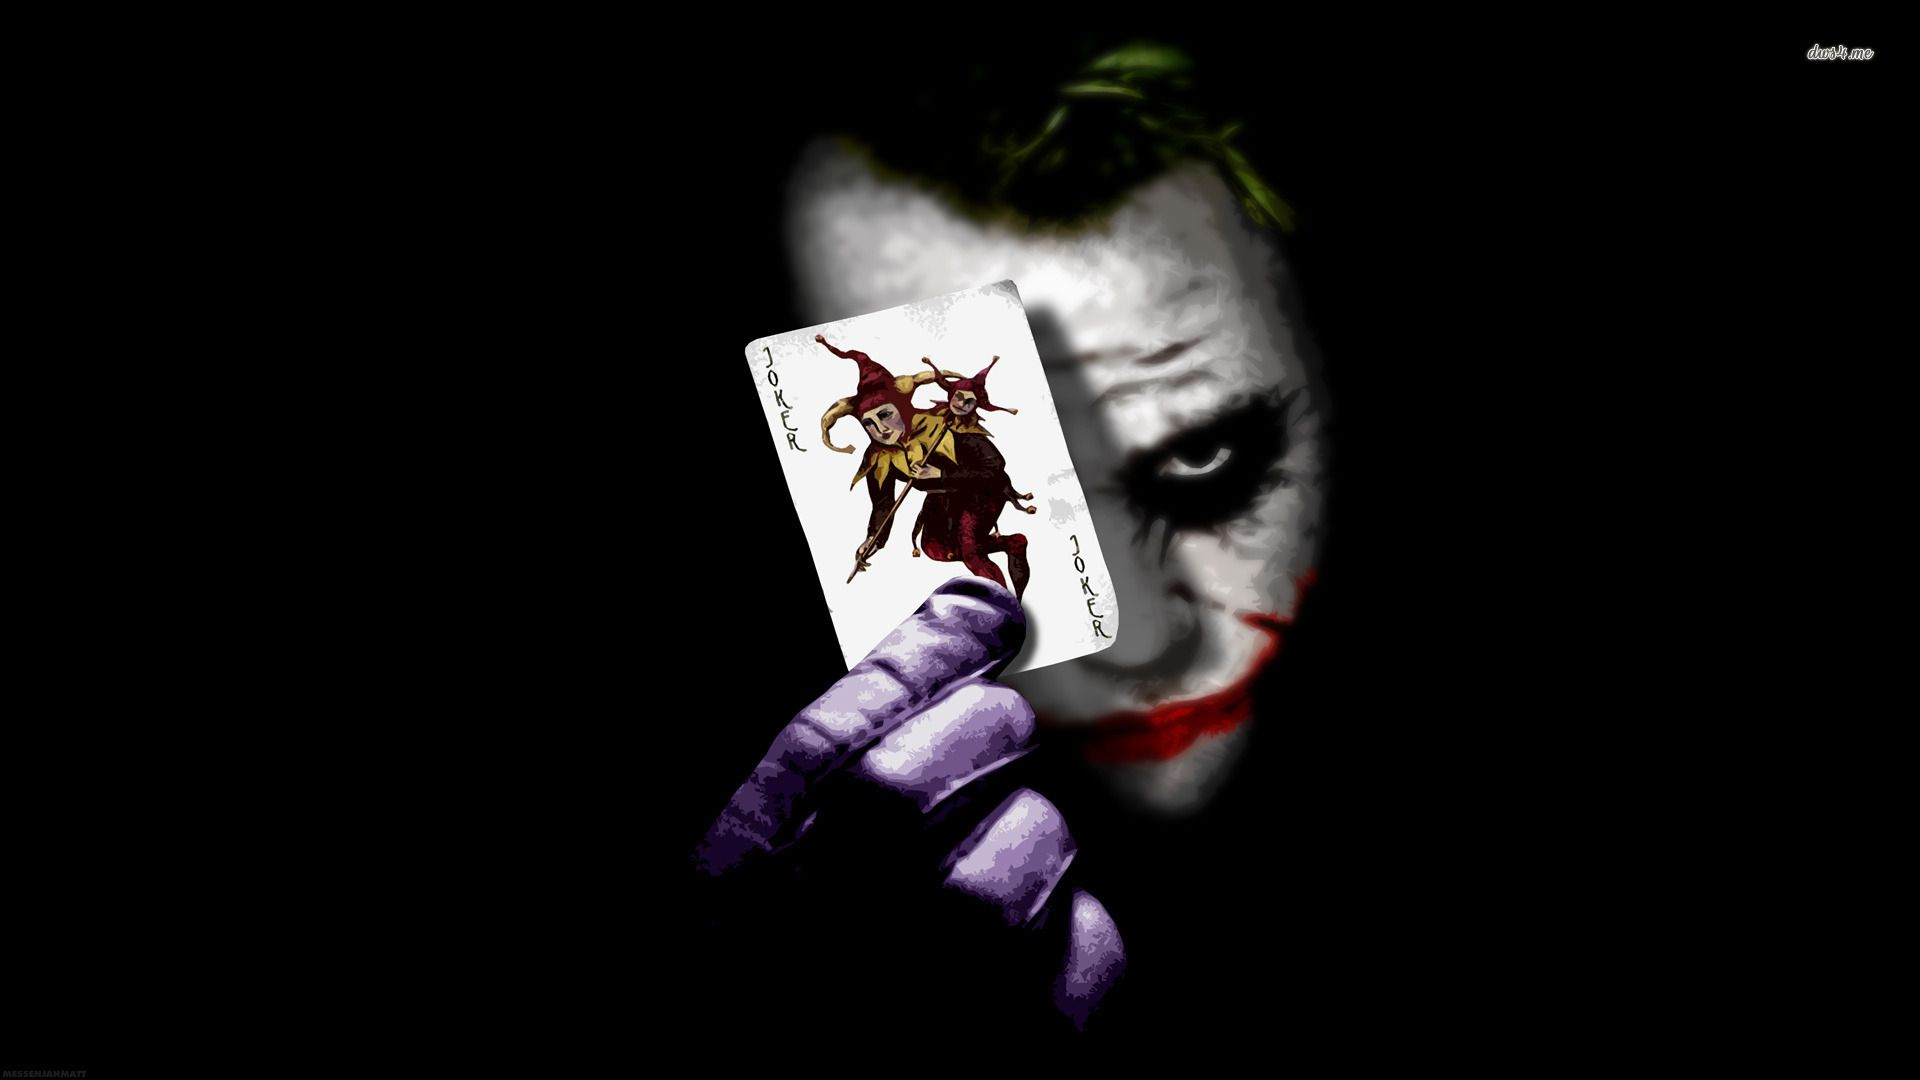 Why So Serious Dc Universe Joker Wallpapers Joker Hd Wallpaper